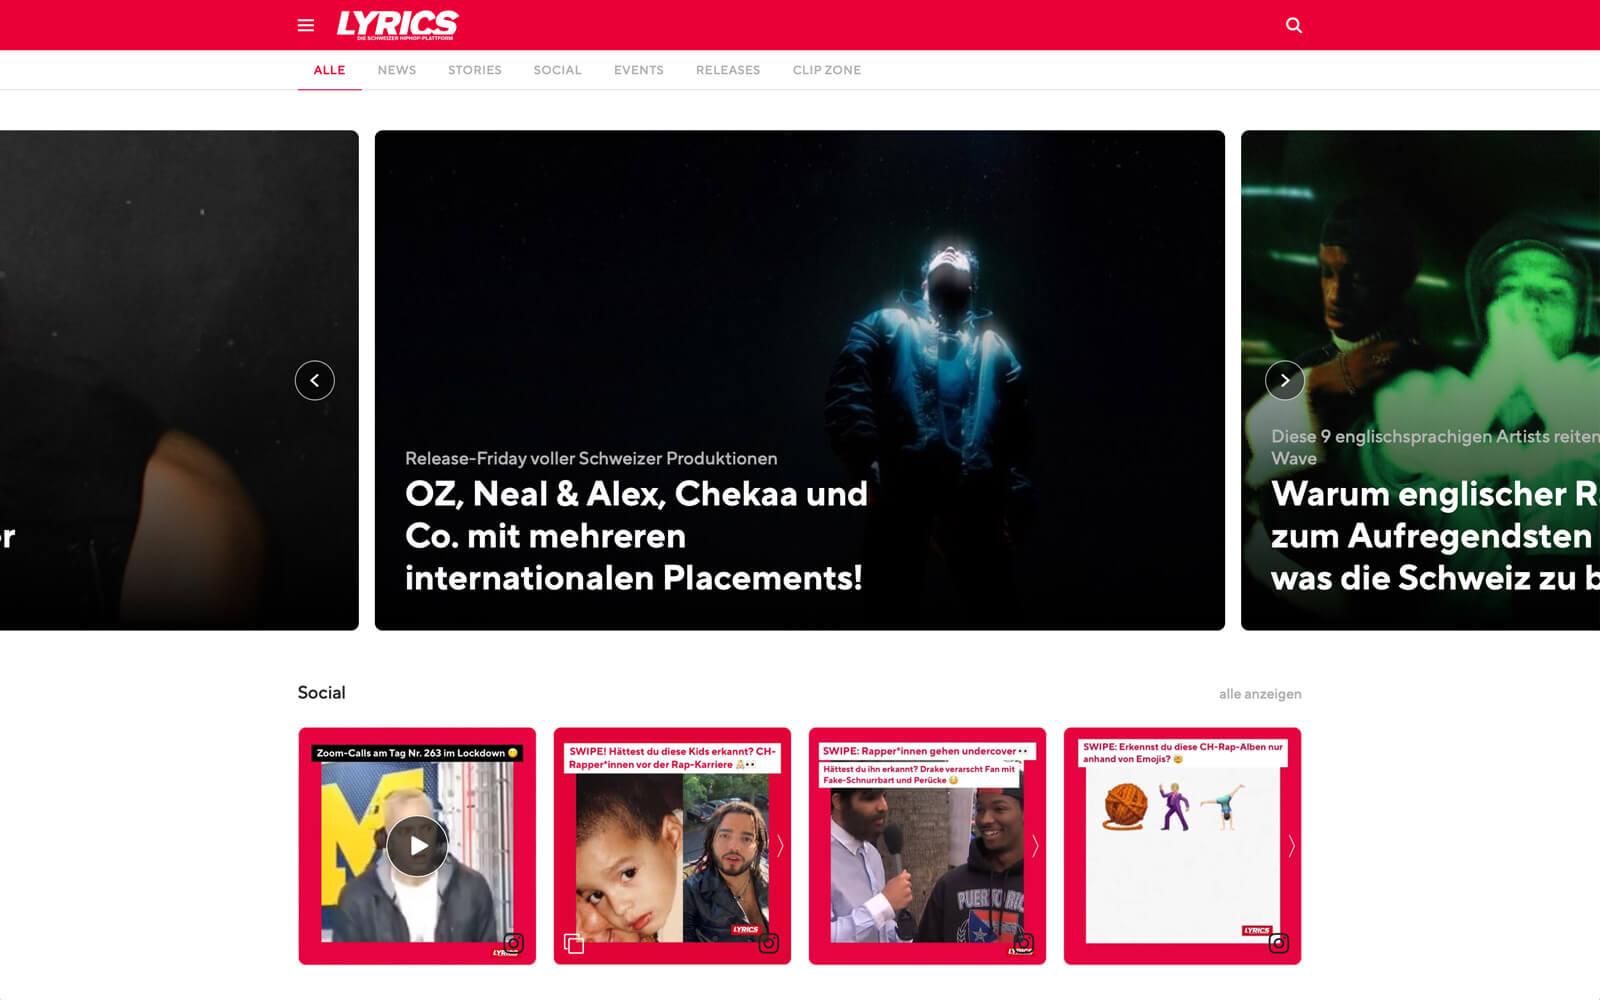 LYRICS Magazin